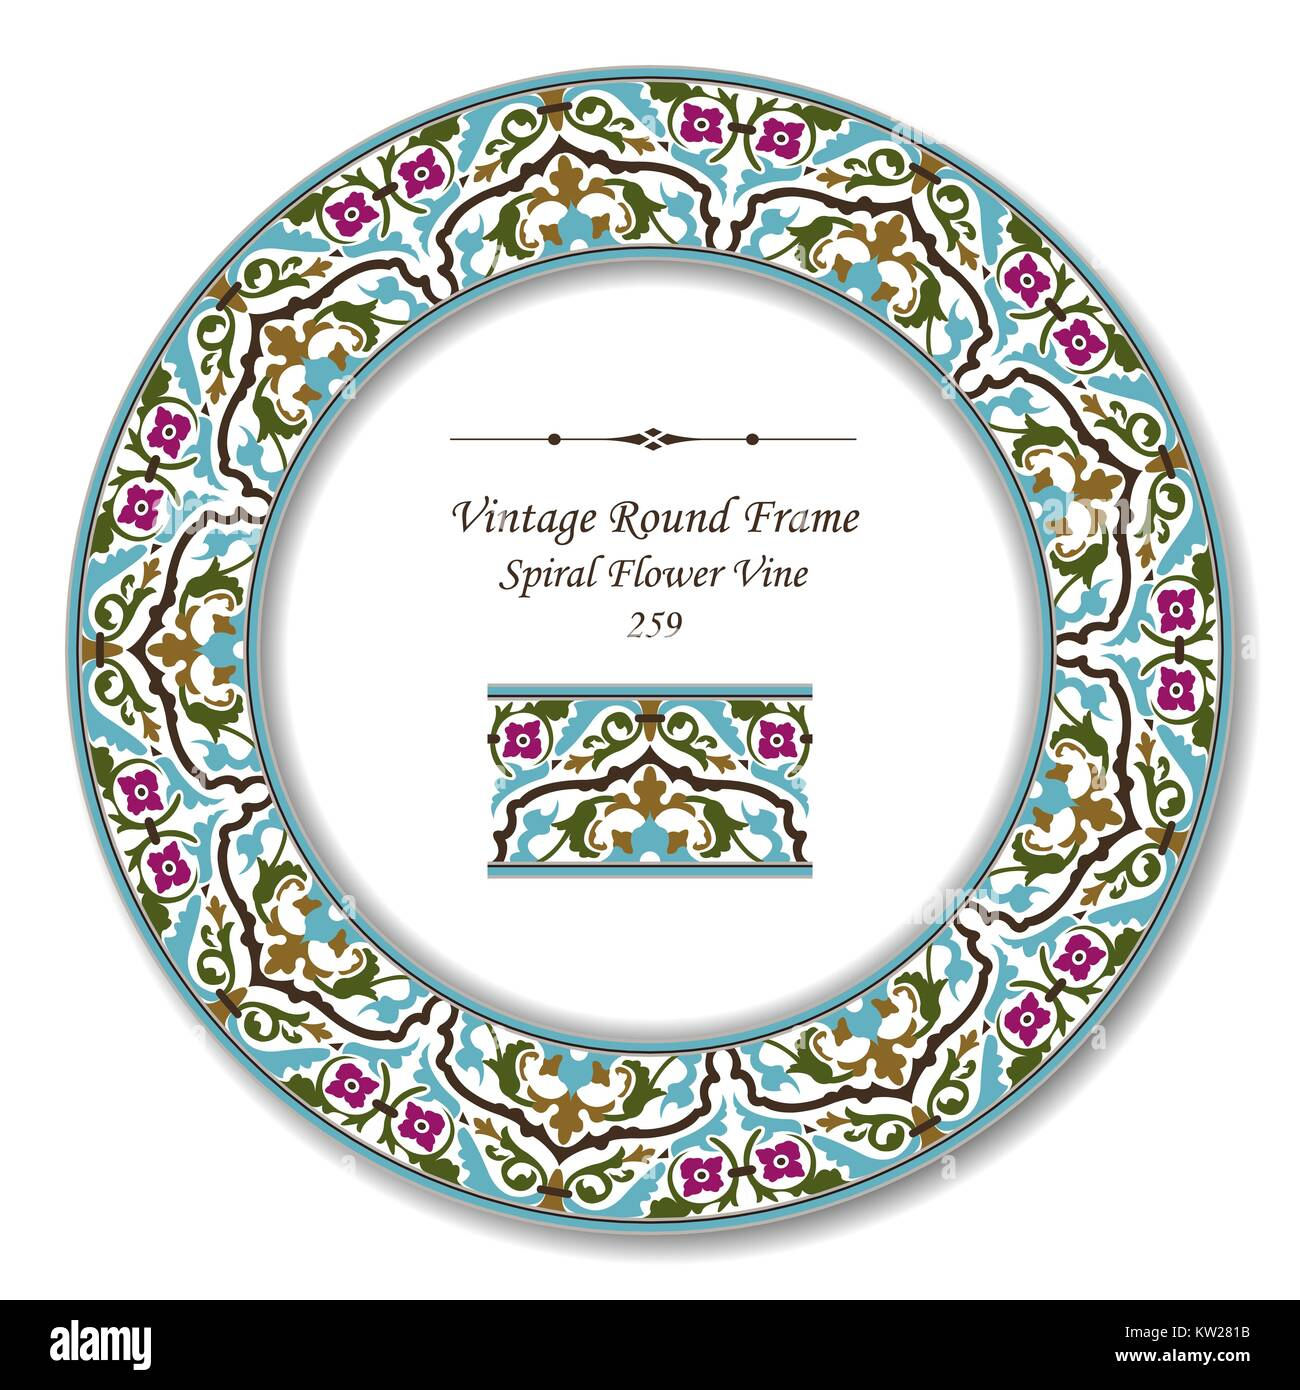 Vintage Round Retro Frame of Botanic Garden Cross Spiral Flower Vine Stock Vector